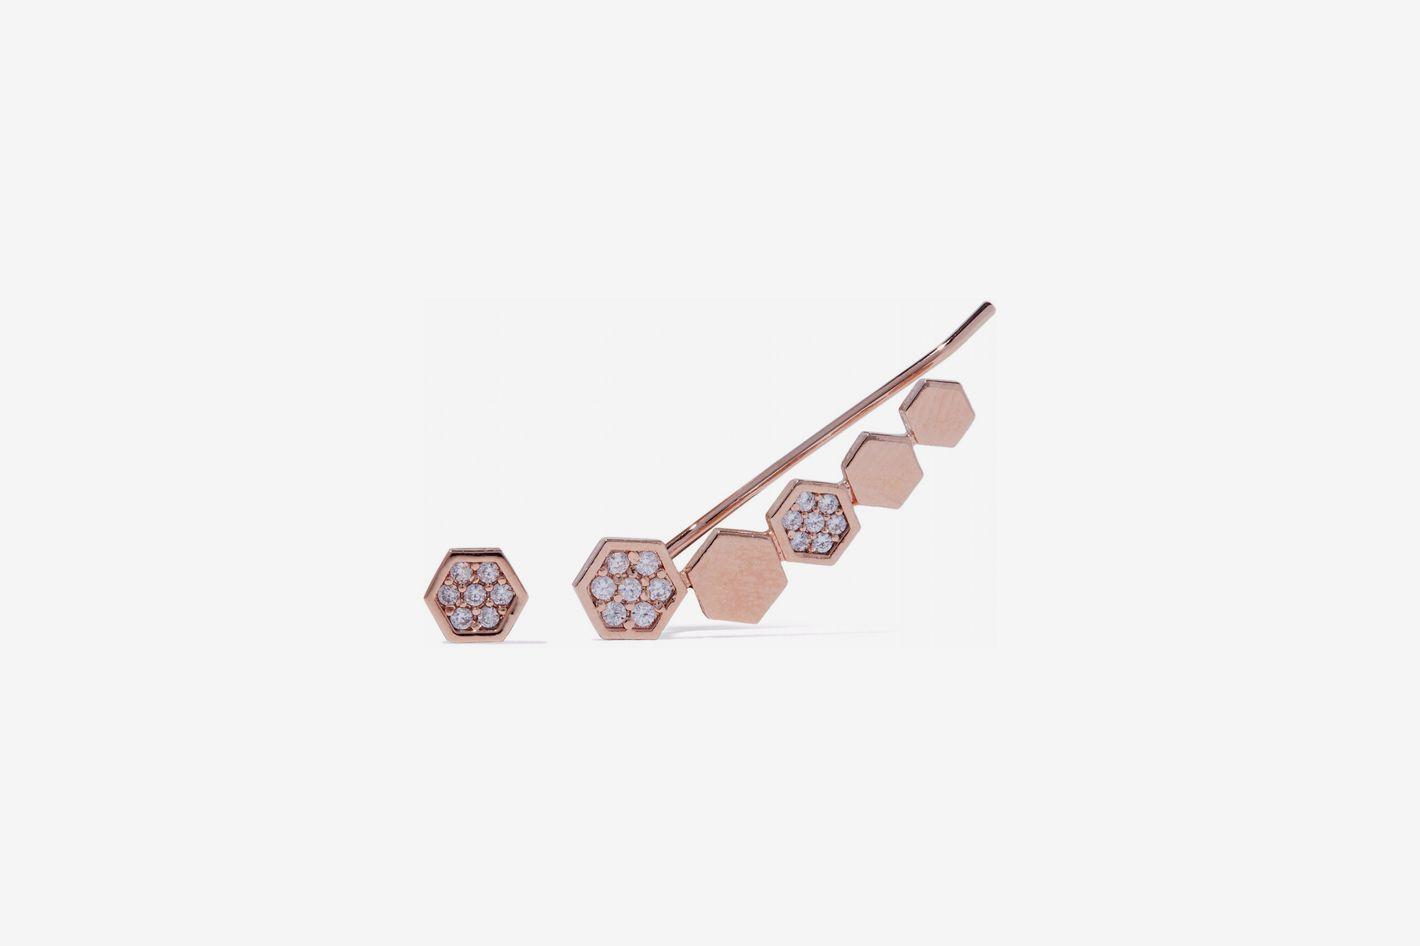 Astrid & Miyu Black Magic 18-Karat Rose Gold-Plated Crystal Ear Cuff